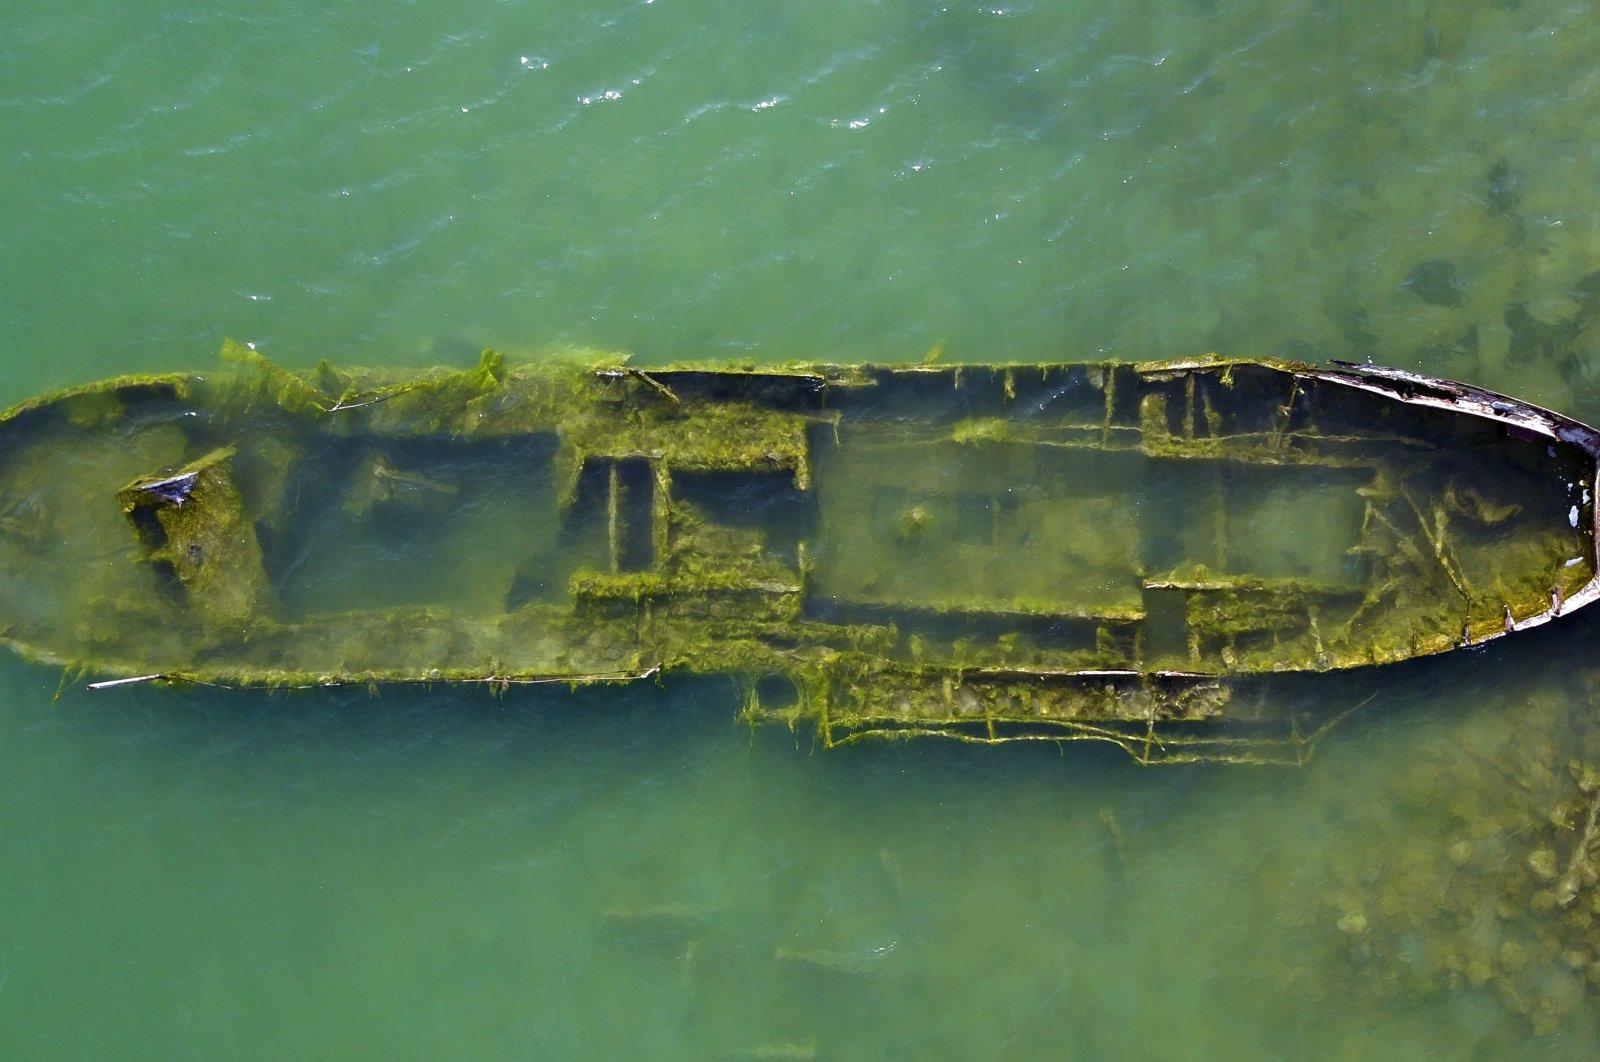 The recently revealed sunken ship in Lake Van, in Van province, eastern Turkey, Feb. 17, 2021. (AA Photo)